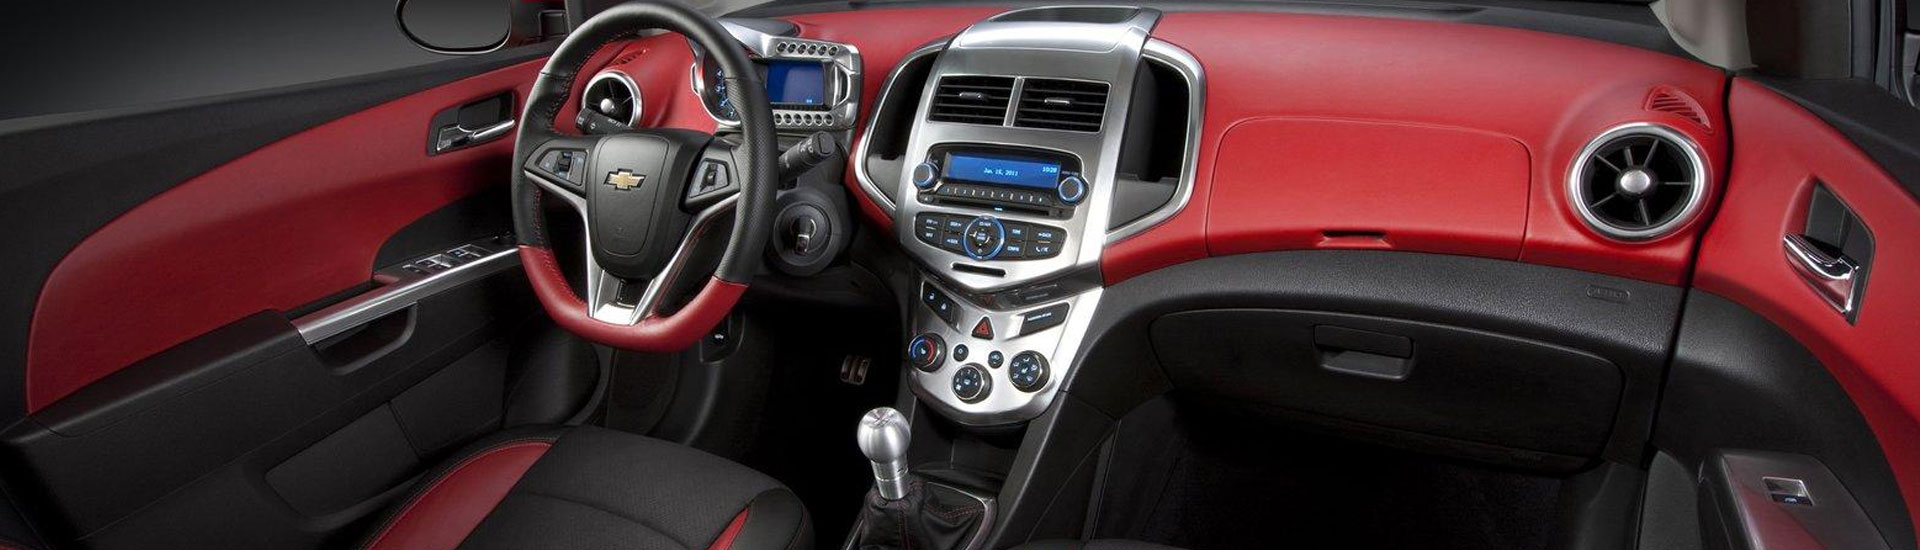 Chevy Sonic Custom >> Chevrolet Sonic Dash Kits Custom Chevrolet Sonic Dash Kit